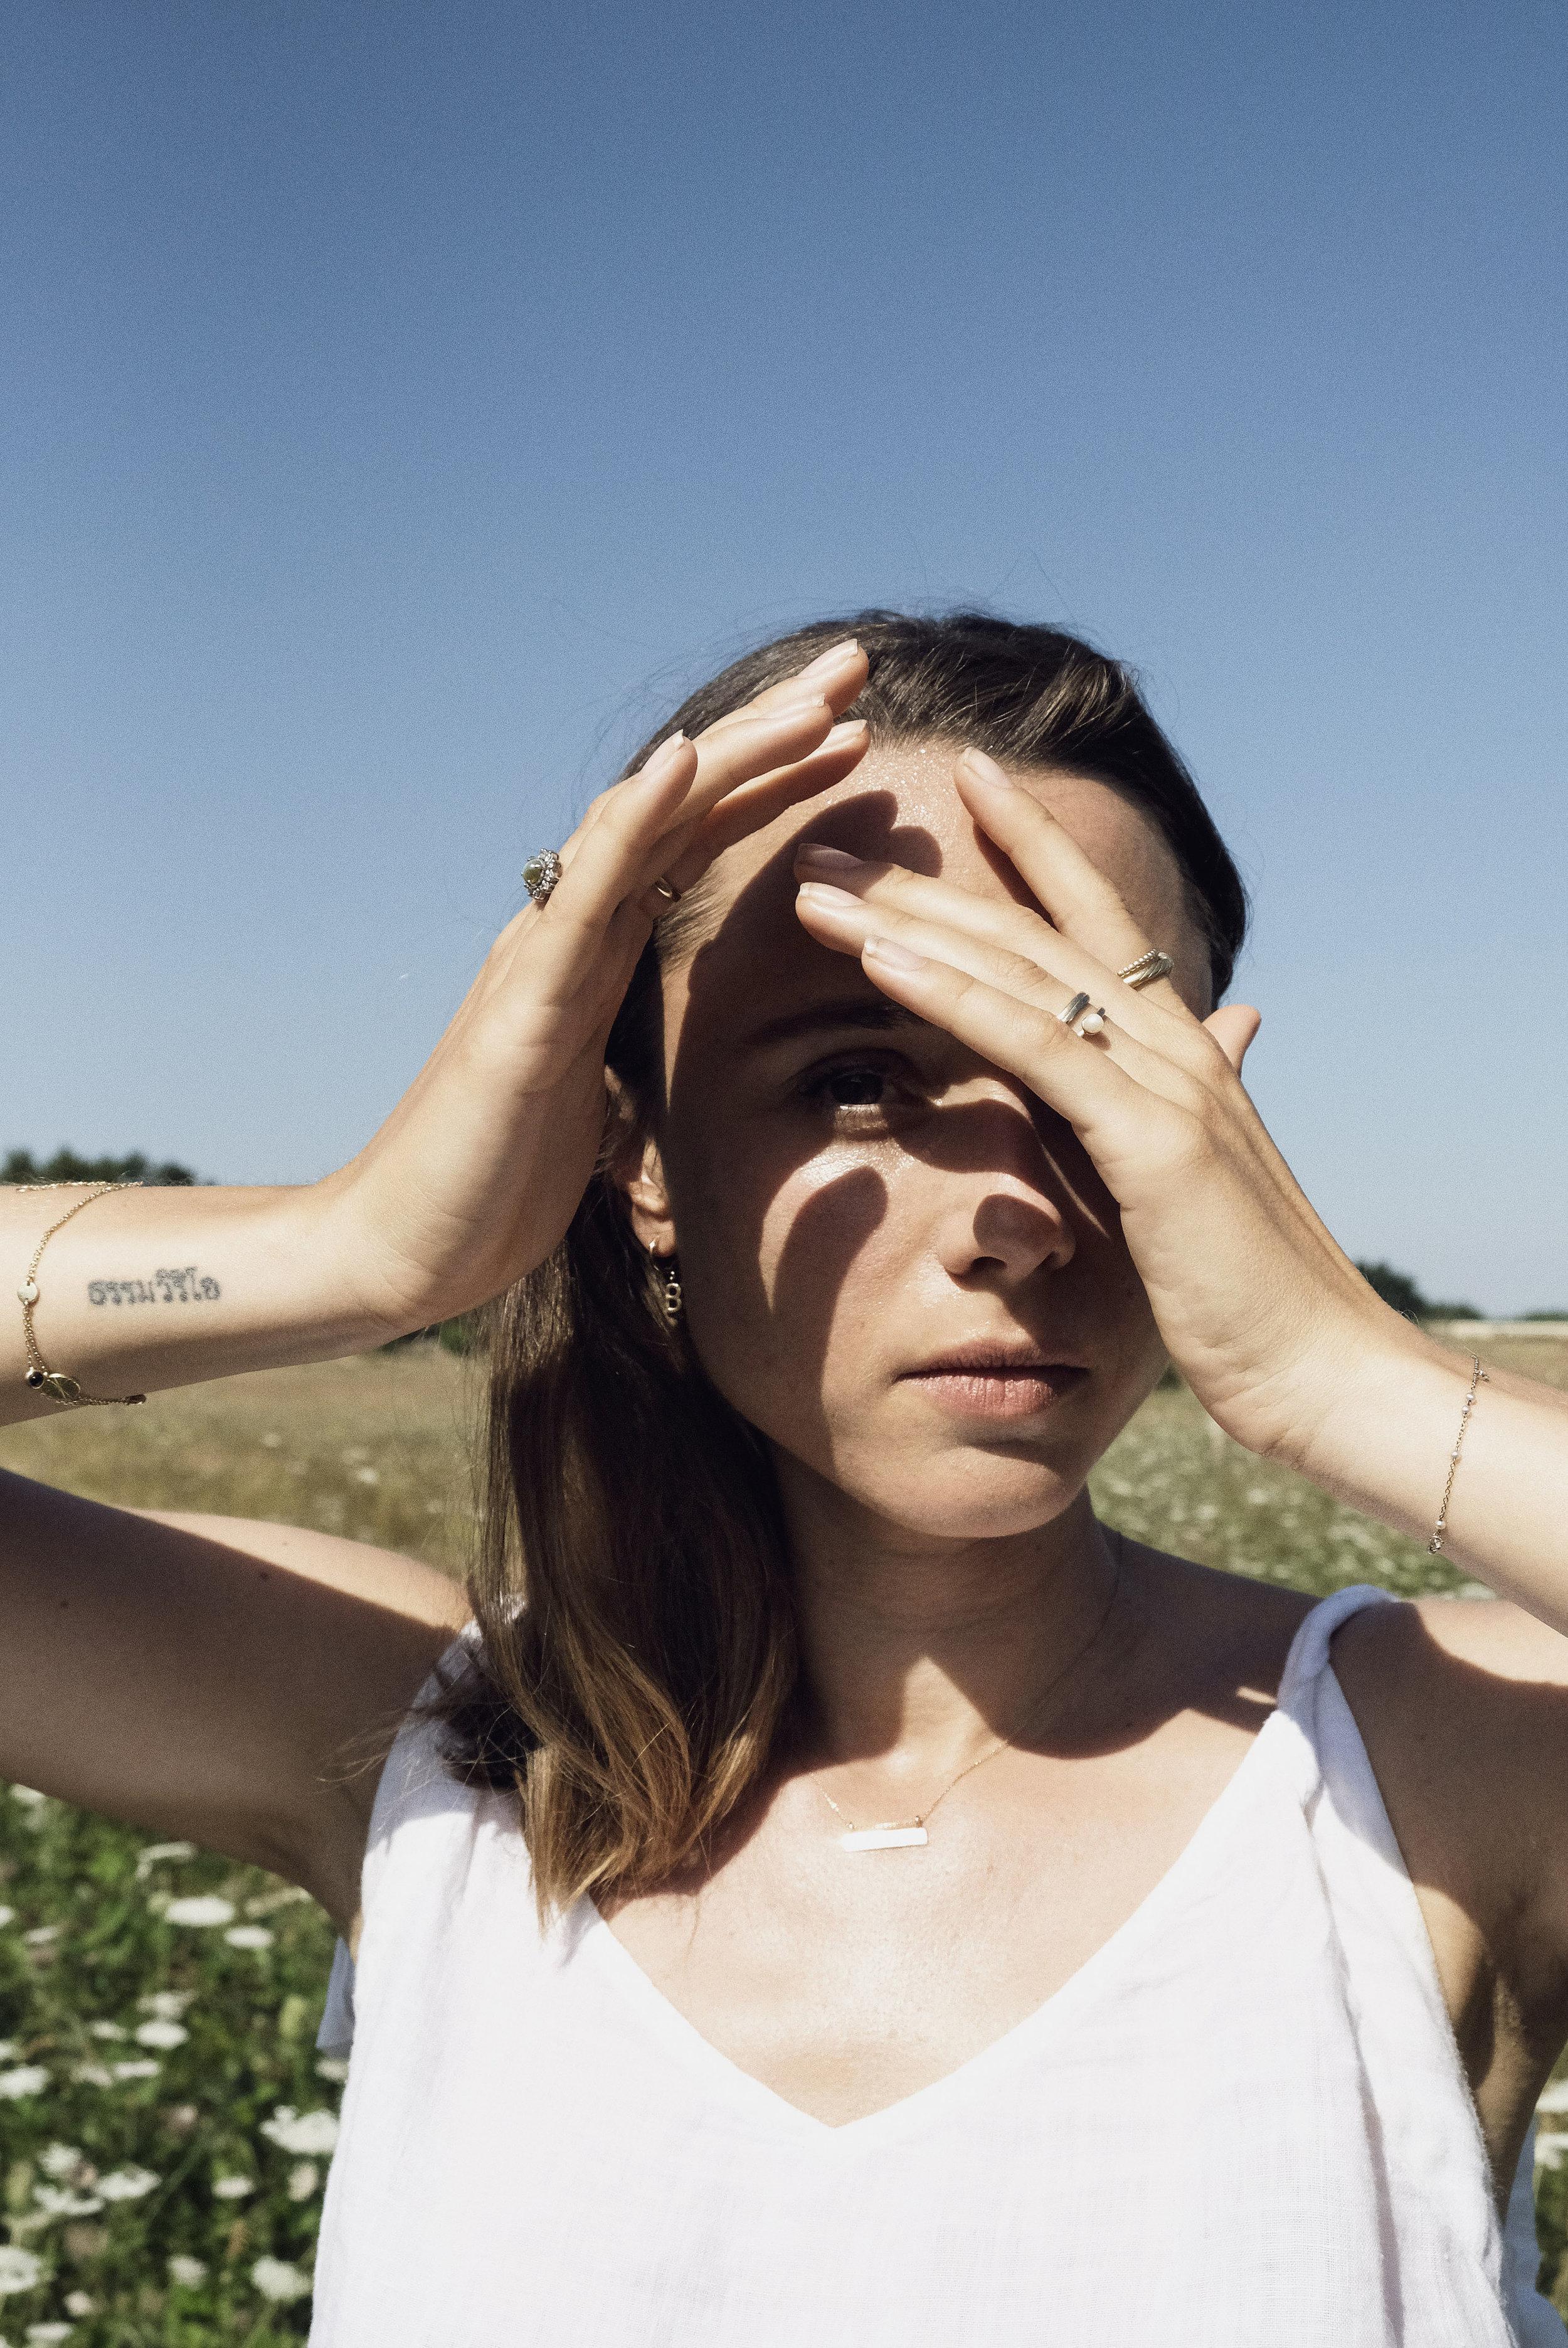 Soul Photography Project - Nina